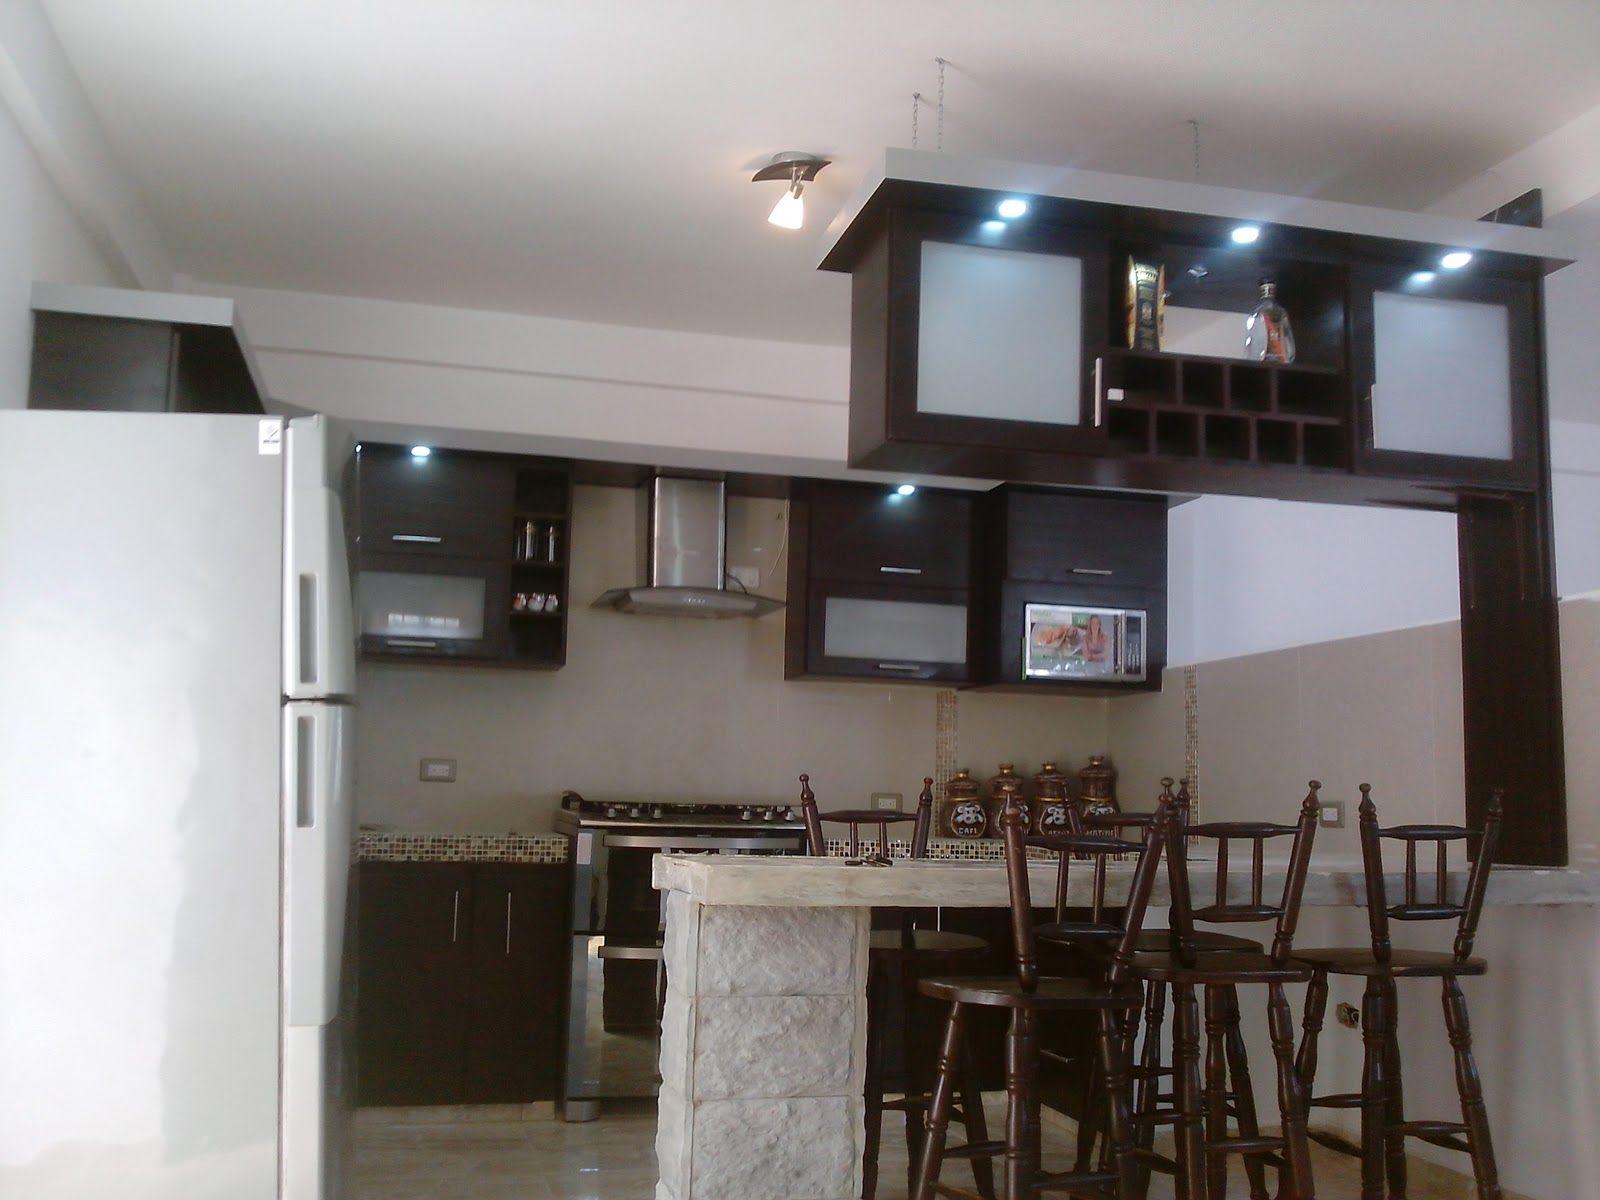 cocina bar - Google Search | Hogar | Pinterest | Bar